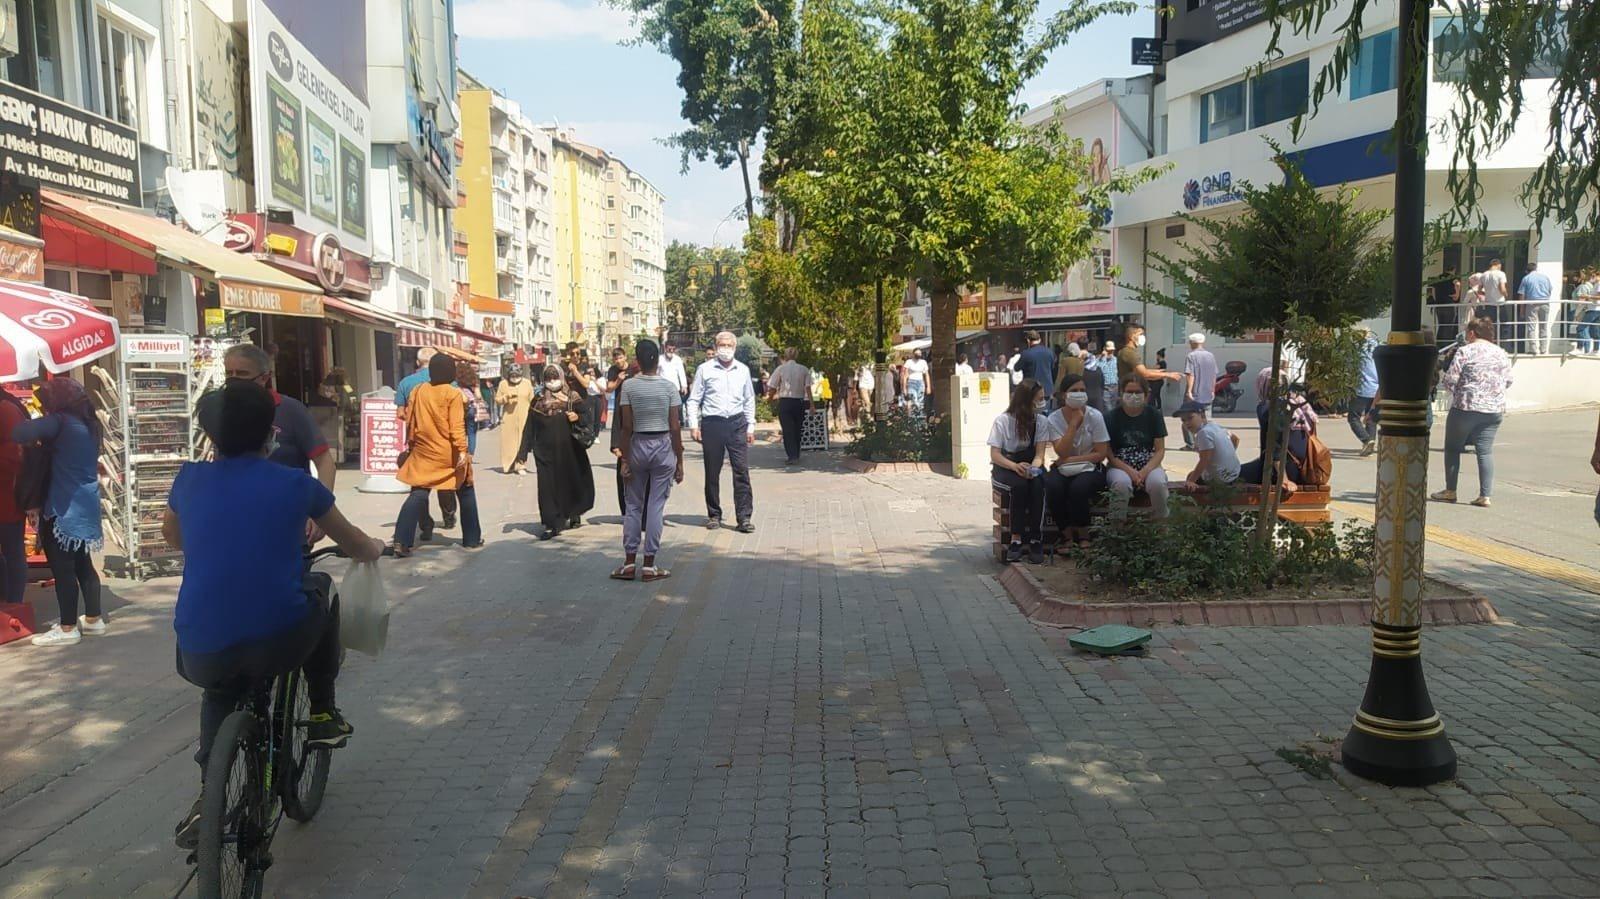 A view of a street in Kütahya, western Turkey, Aug. 31, 2021. (İHA PHOTO)